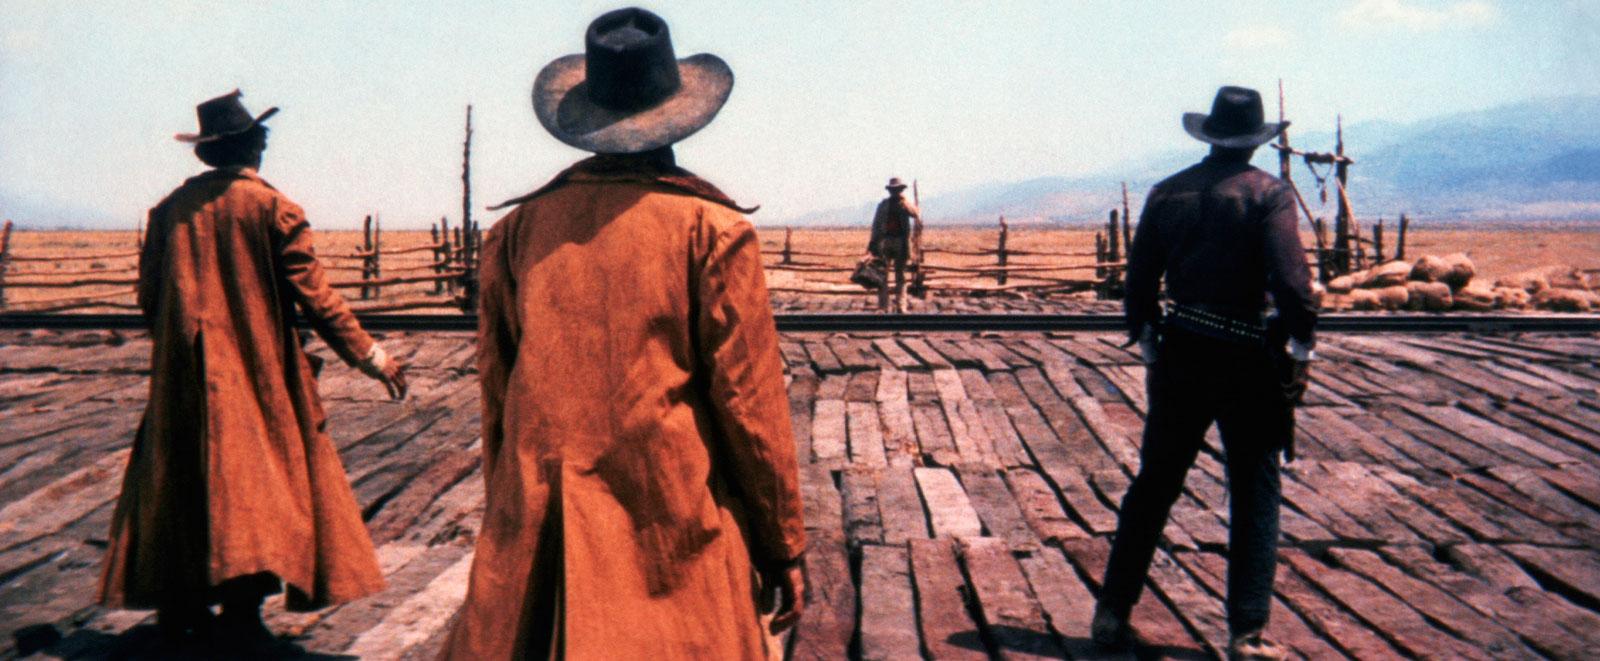 best spaghetti westerns